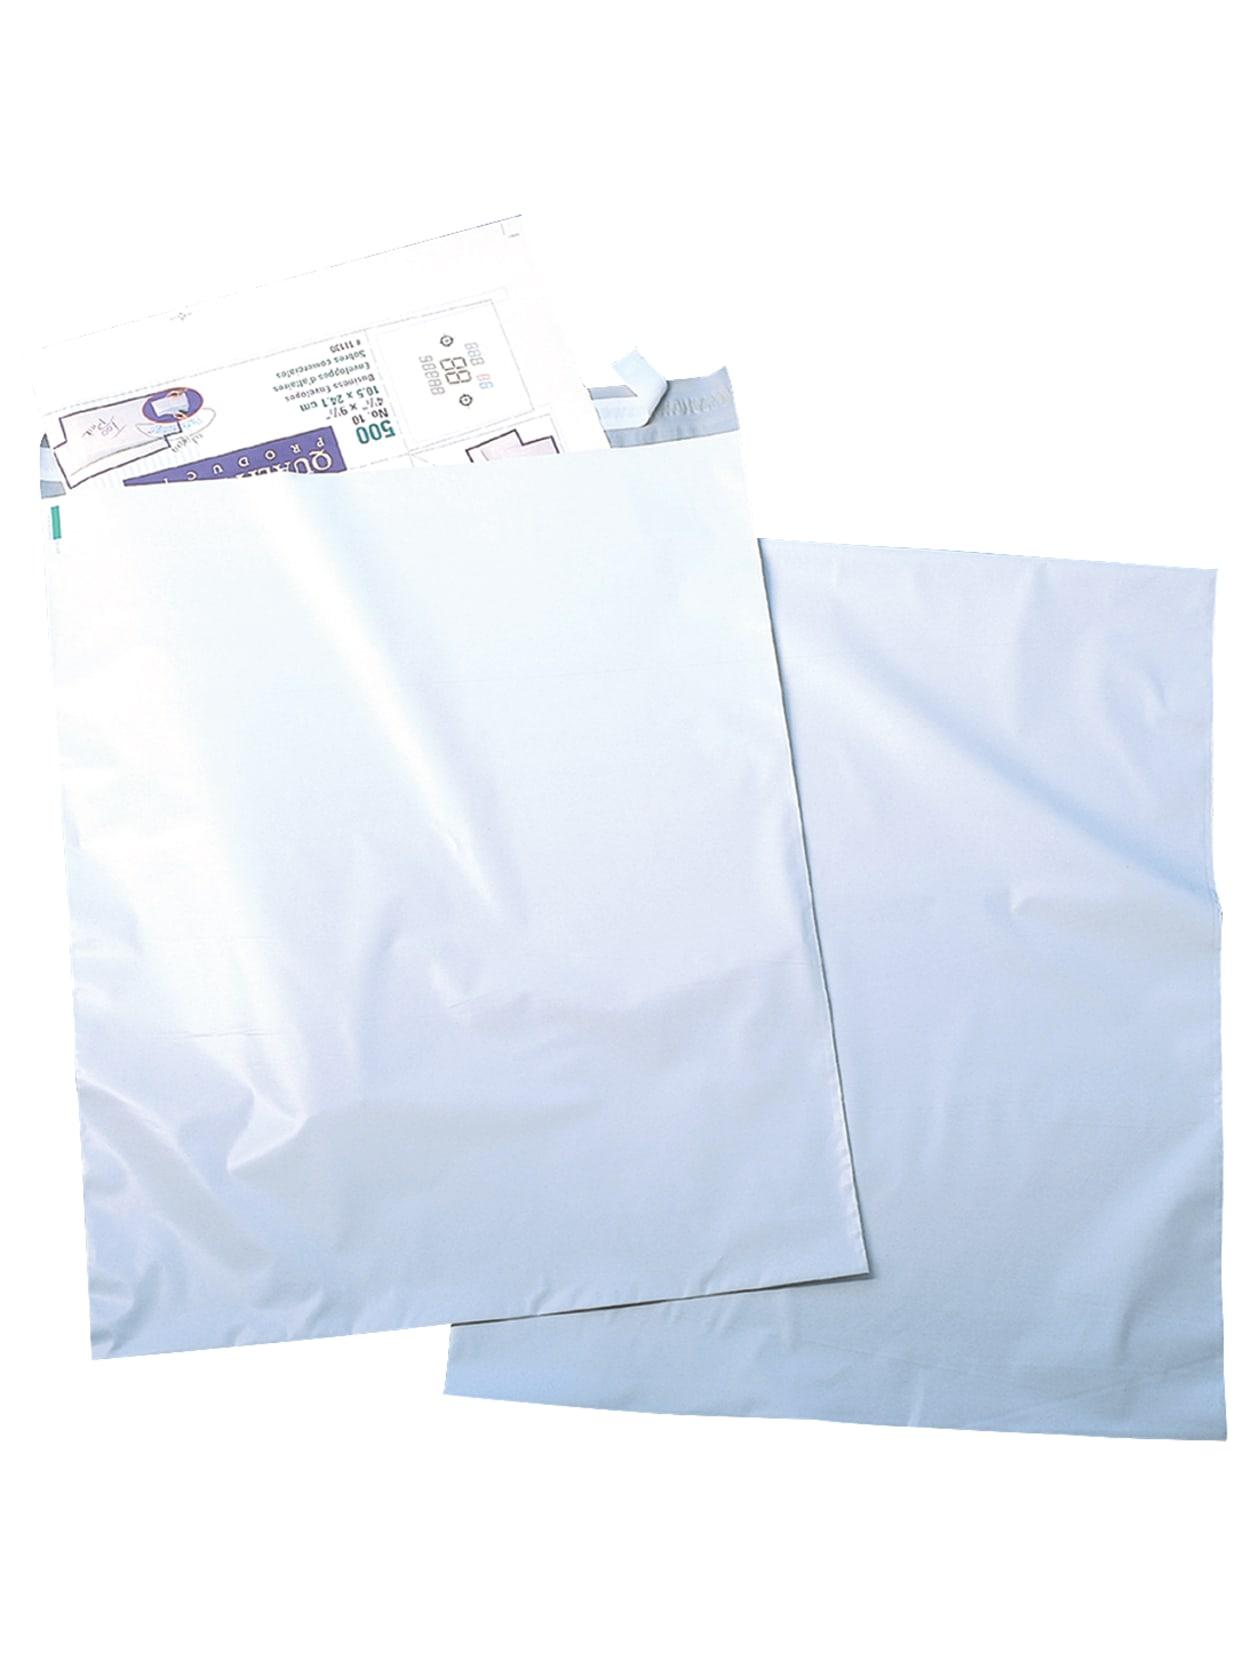 Exacompta Une Boite de 100 Peignes Plastiques 6 mm 21X29,7 cm Blanc Ref 75100E